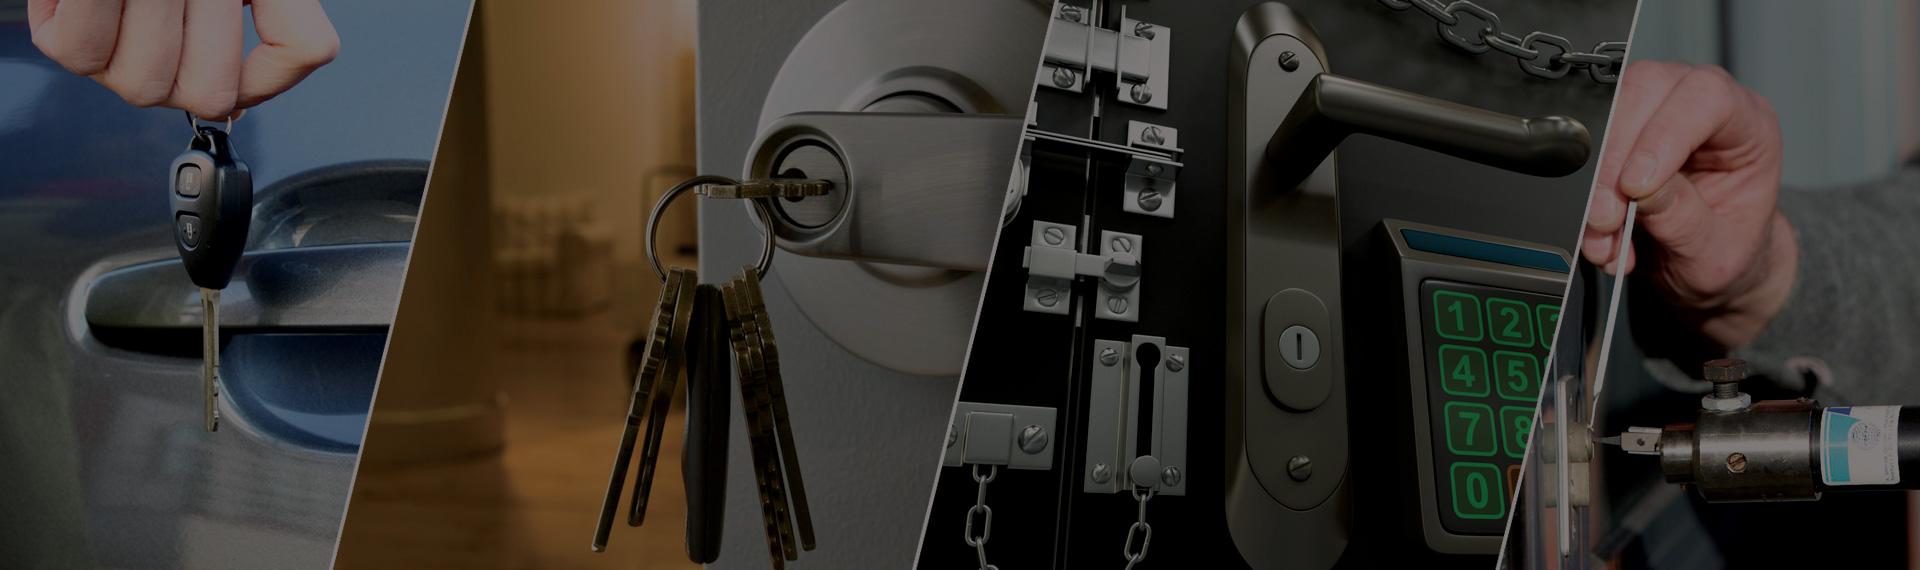 A 24 Hours Emergency Locksmith New Rochelle NY